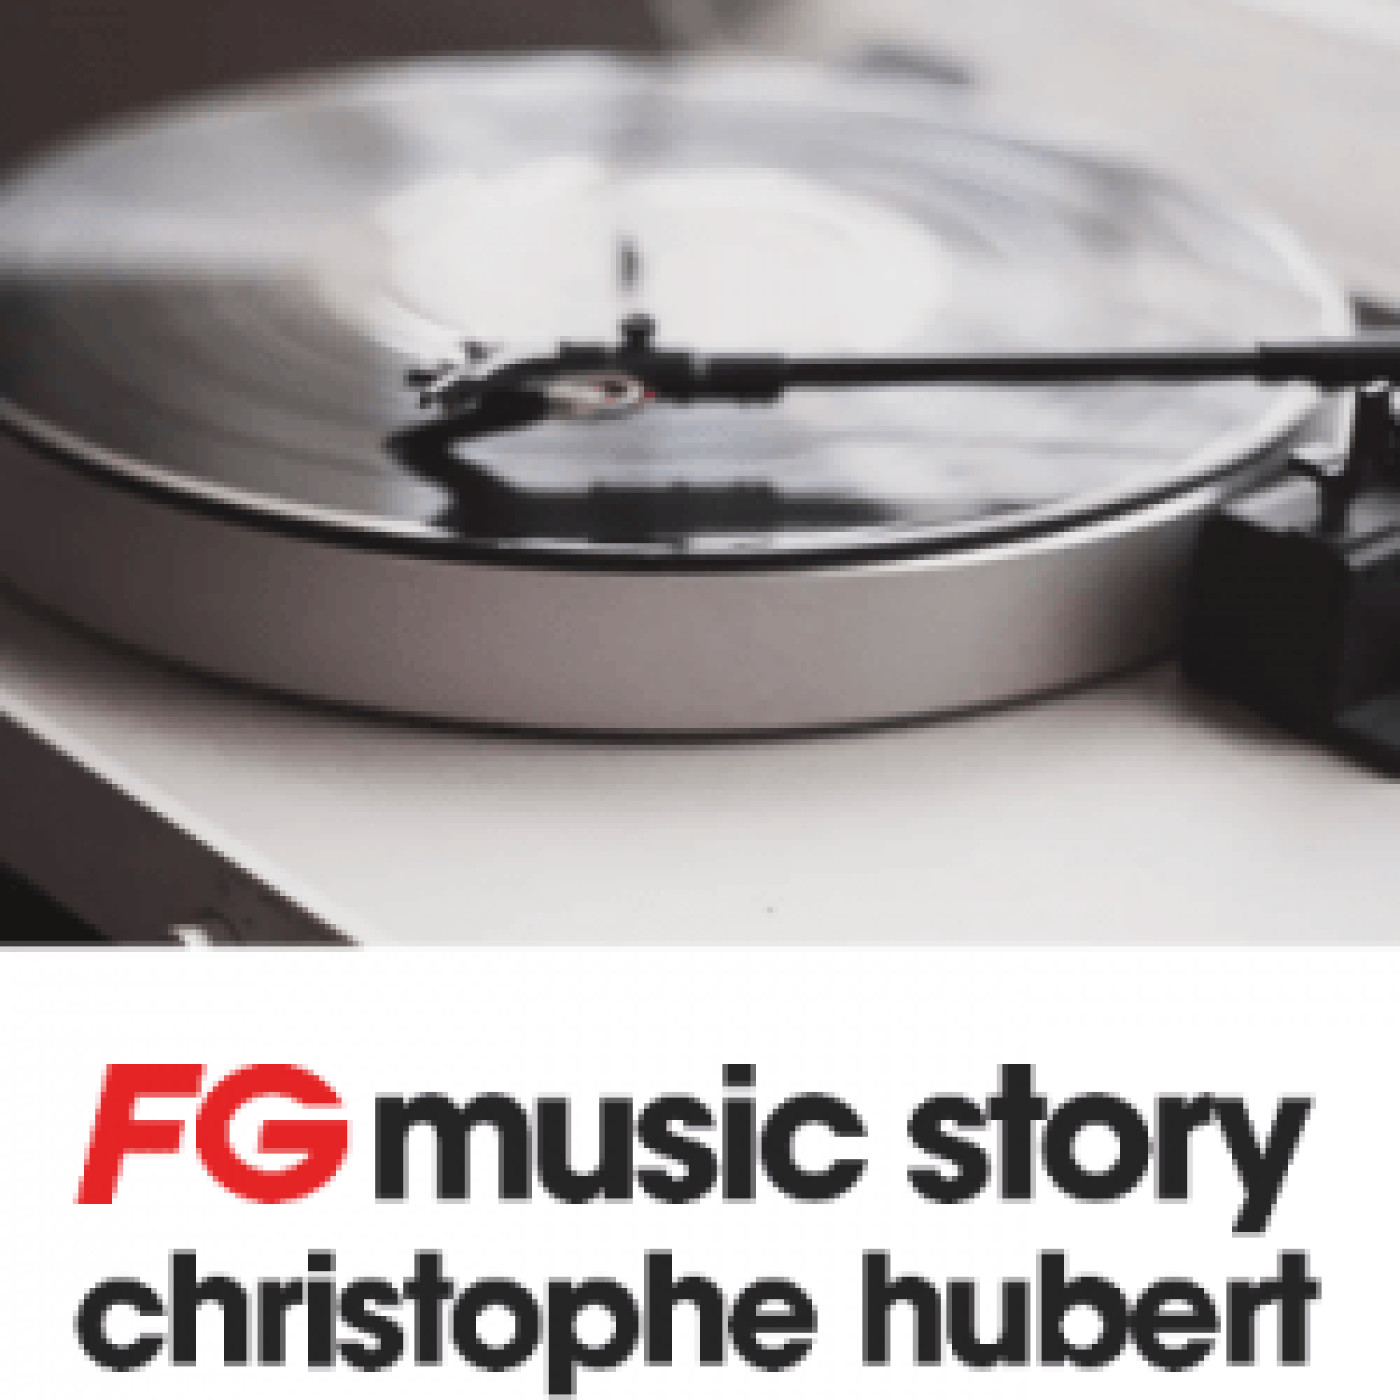 FG MUSIC STORY : KYLIE MINOGUE